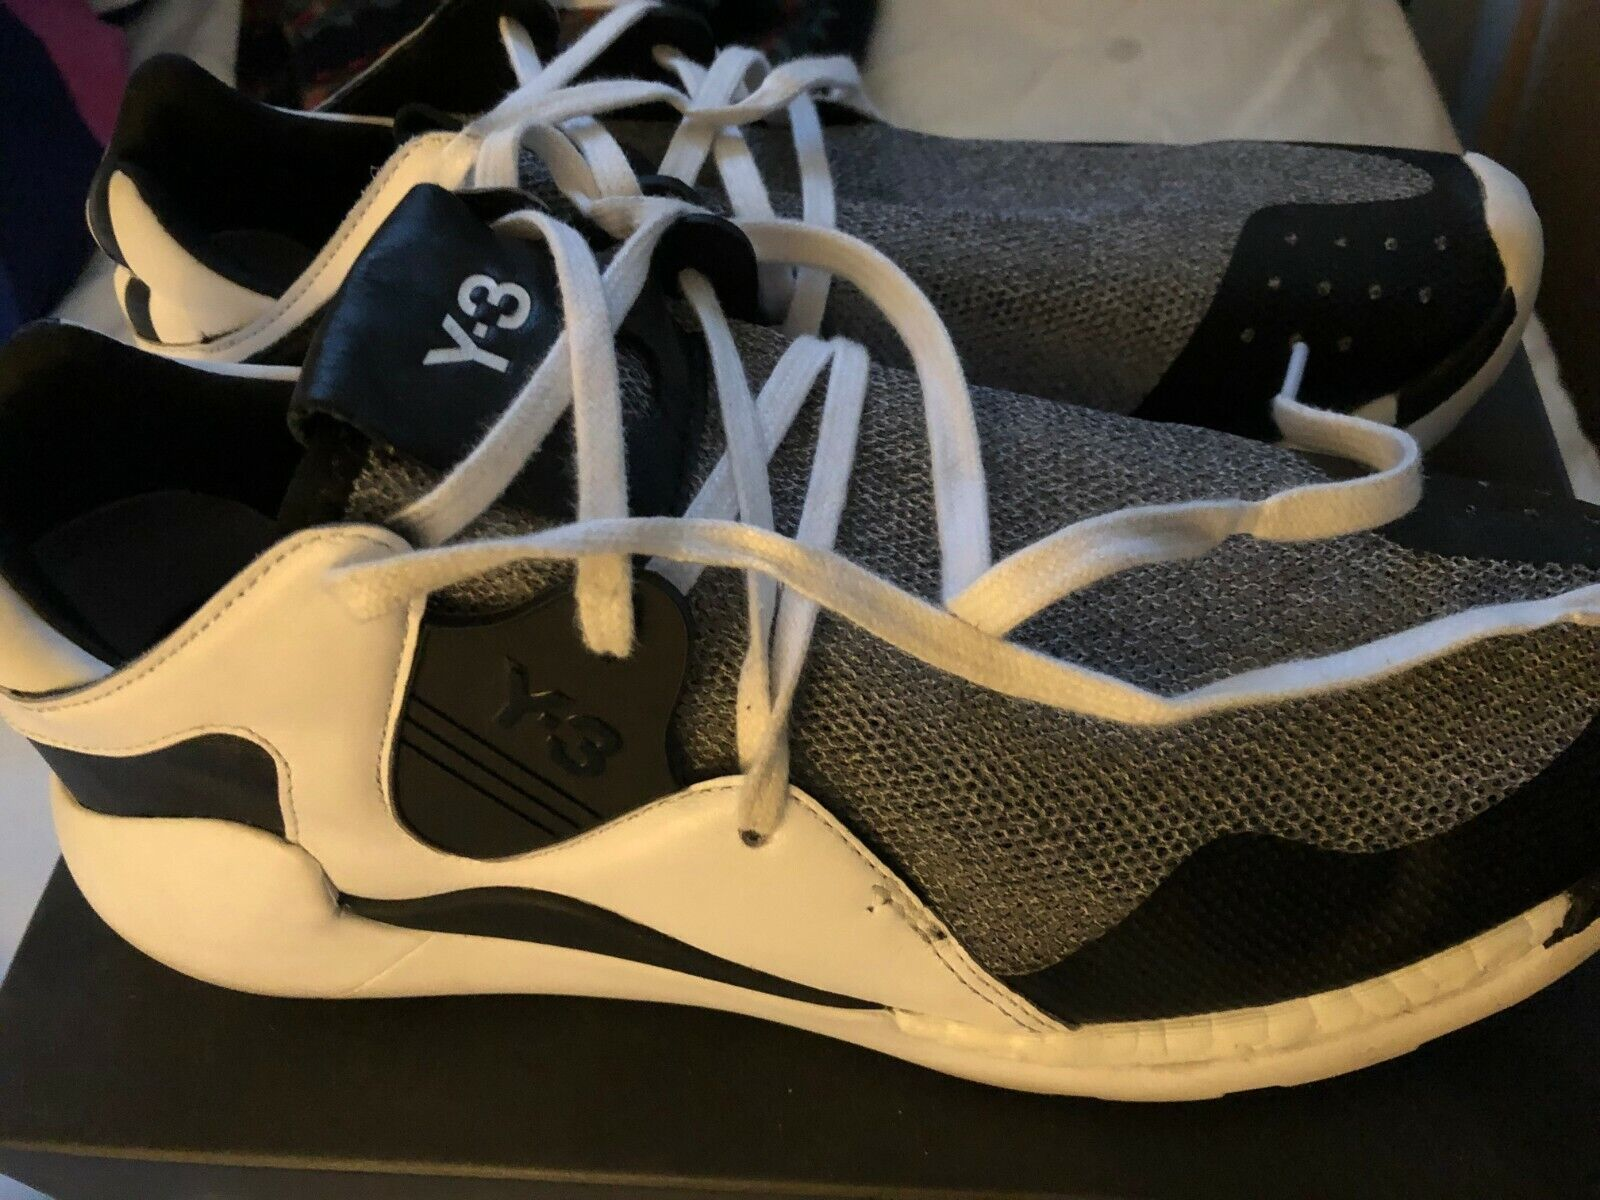 Men's Adidas Y-3 Yohji Yamamoto QR Run Boost AQ5496 Limited Edition Size US 9